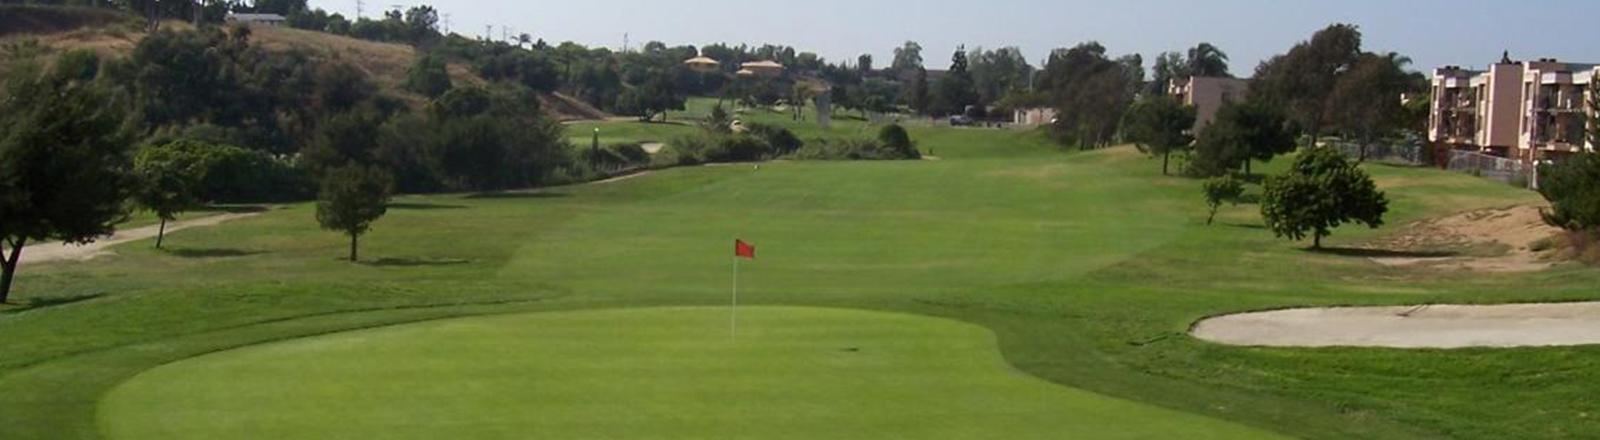 National City Golf Course Header